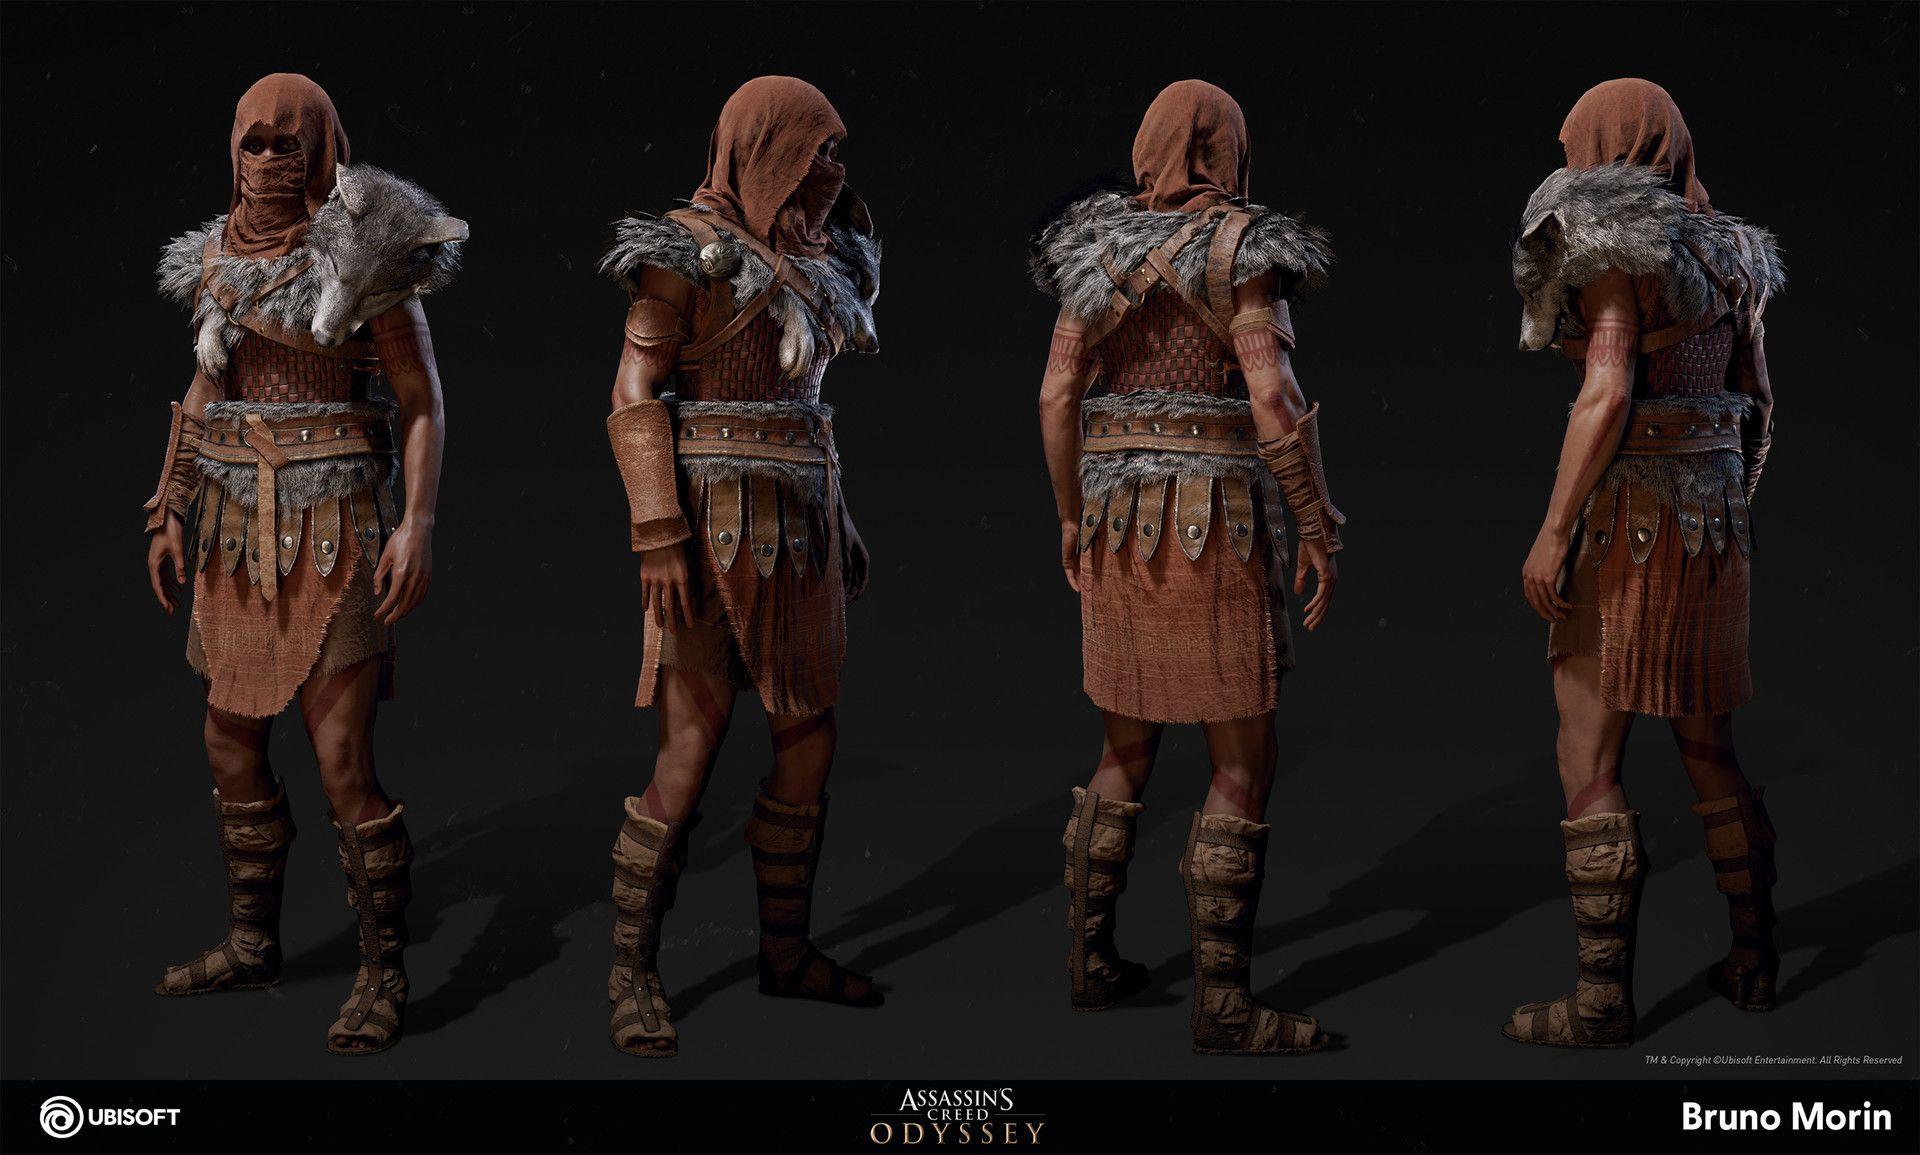 Artstation Assassin S Creed Odyssey Daughters Of Artemis Amazon Bruno Morin Assassins Creed Outfit Assassins Creed Art Assassins Creed Artwork